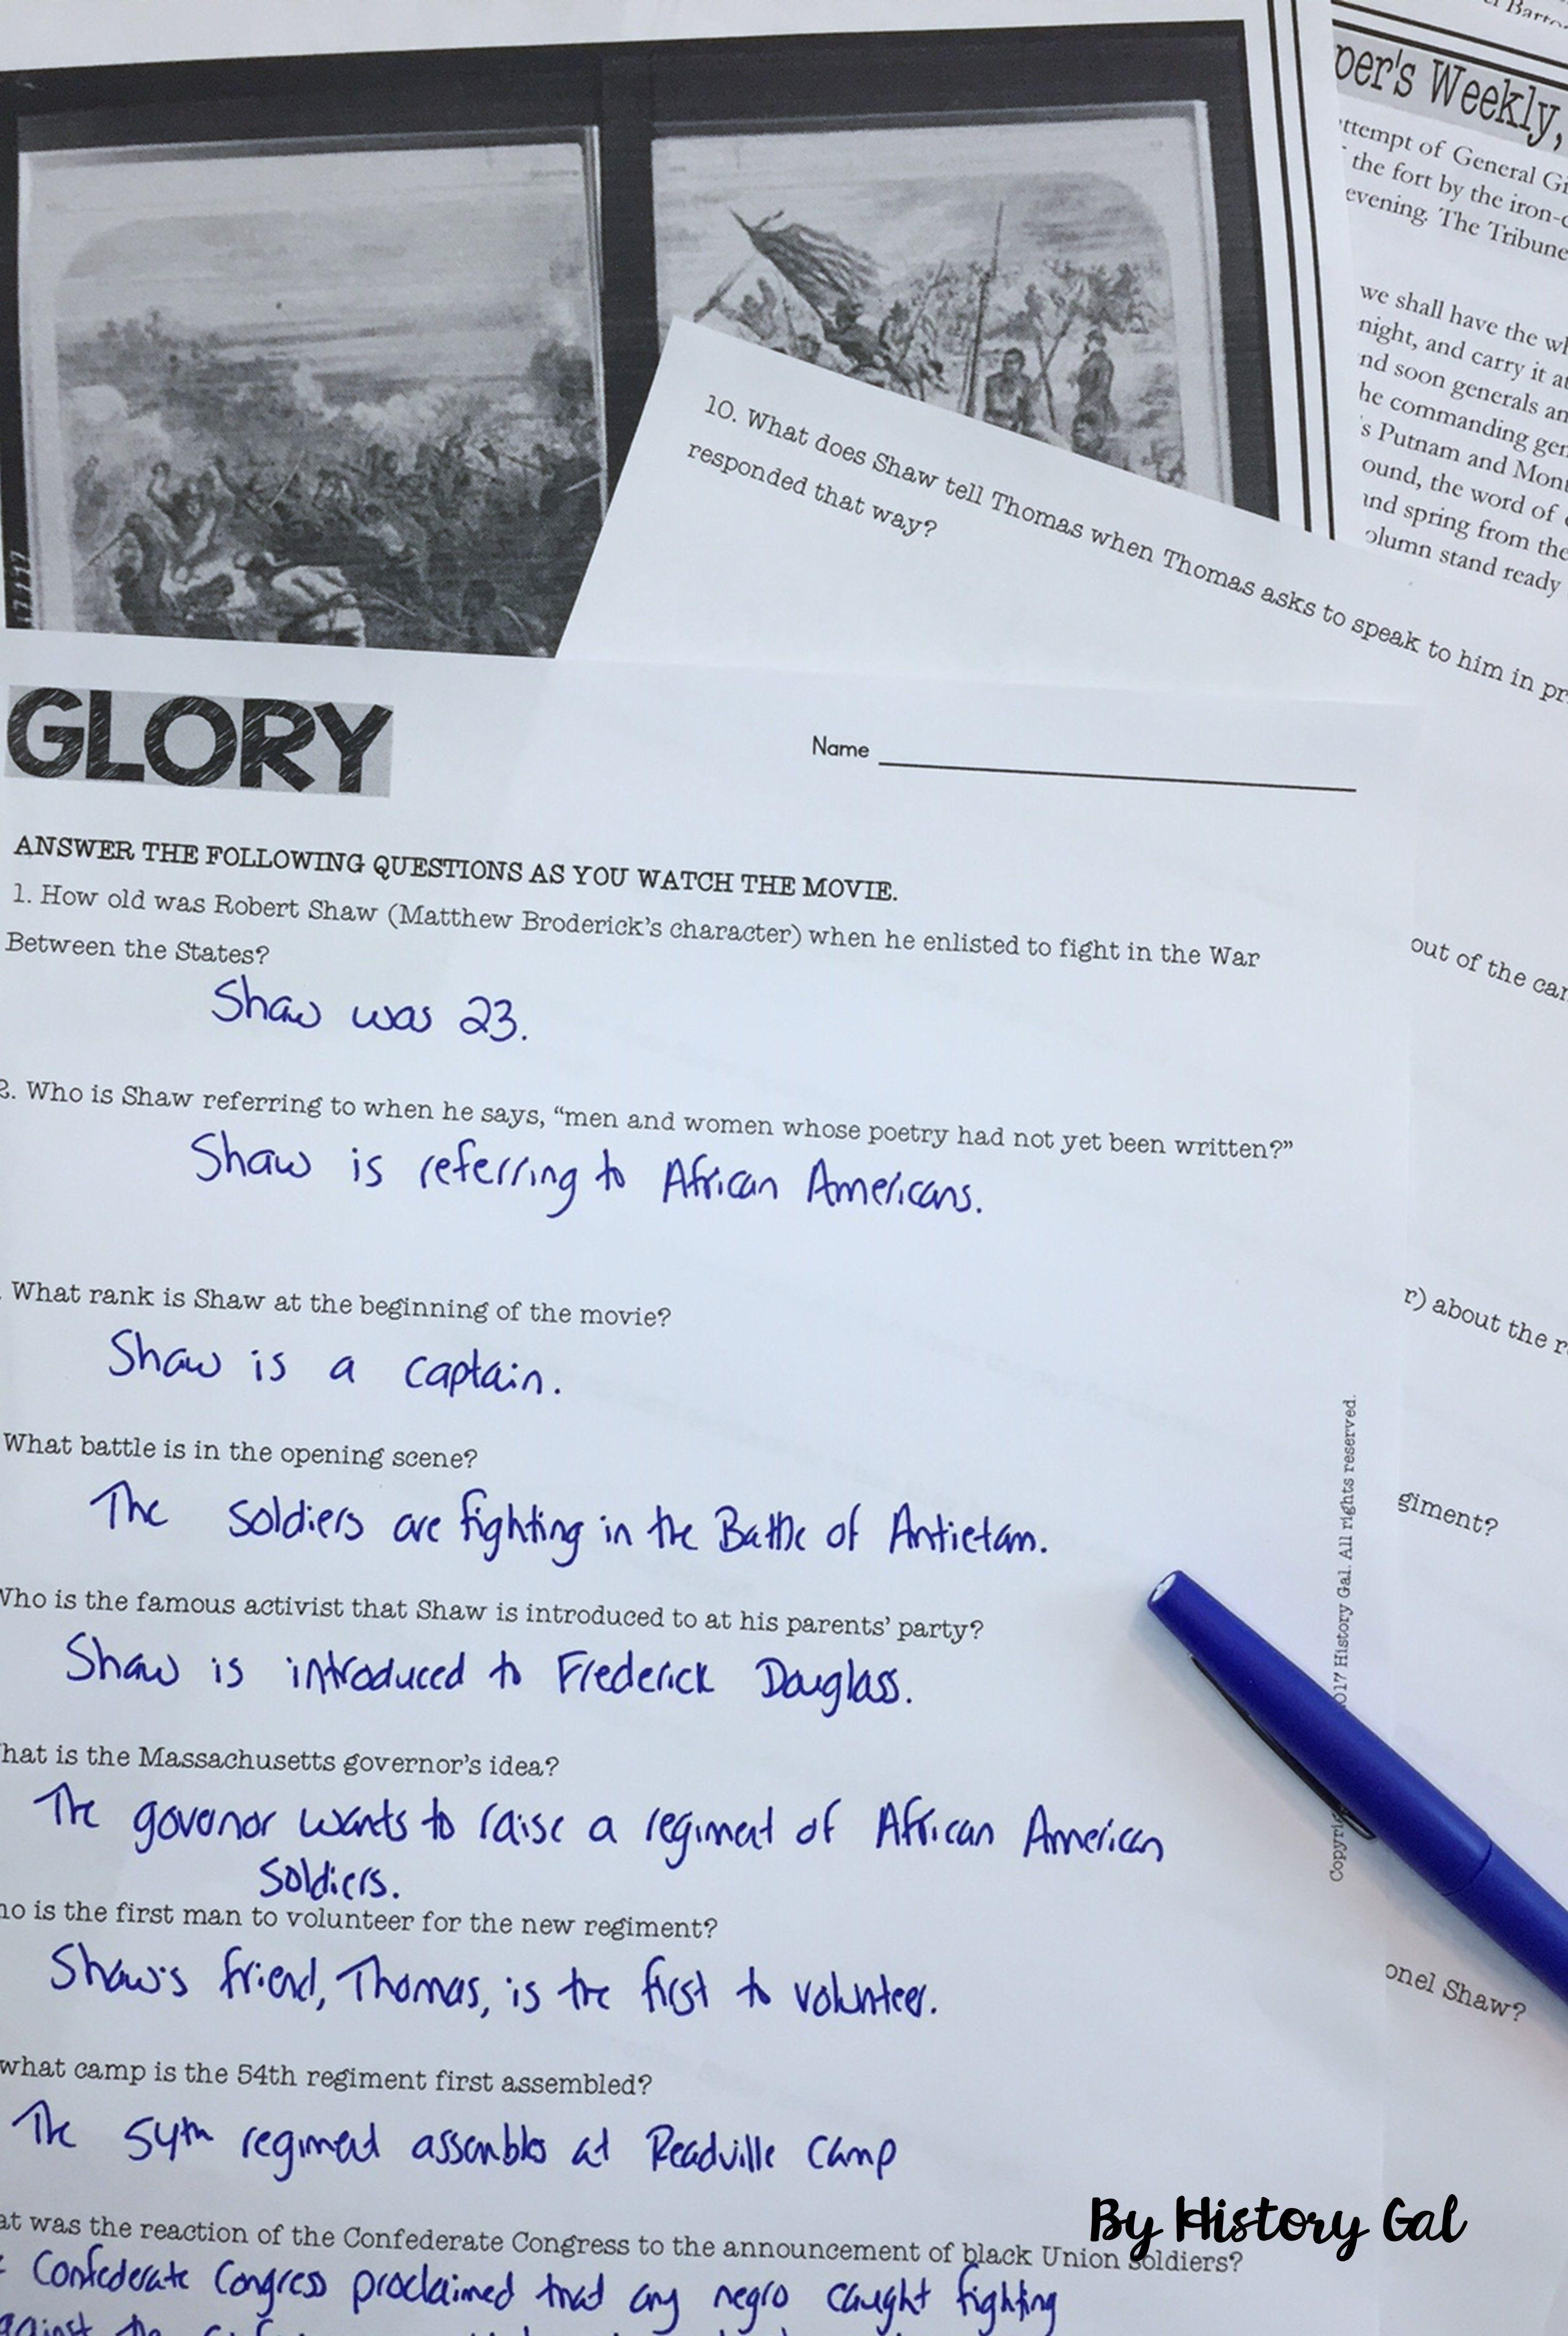 Glory Movie Guide